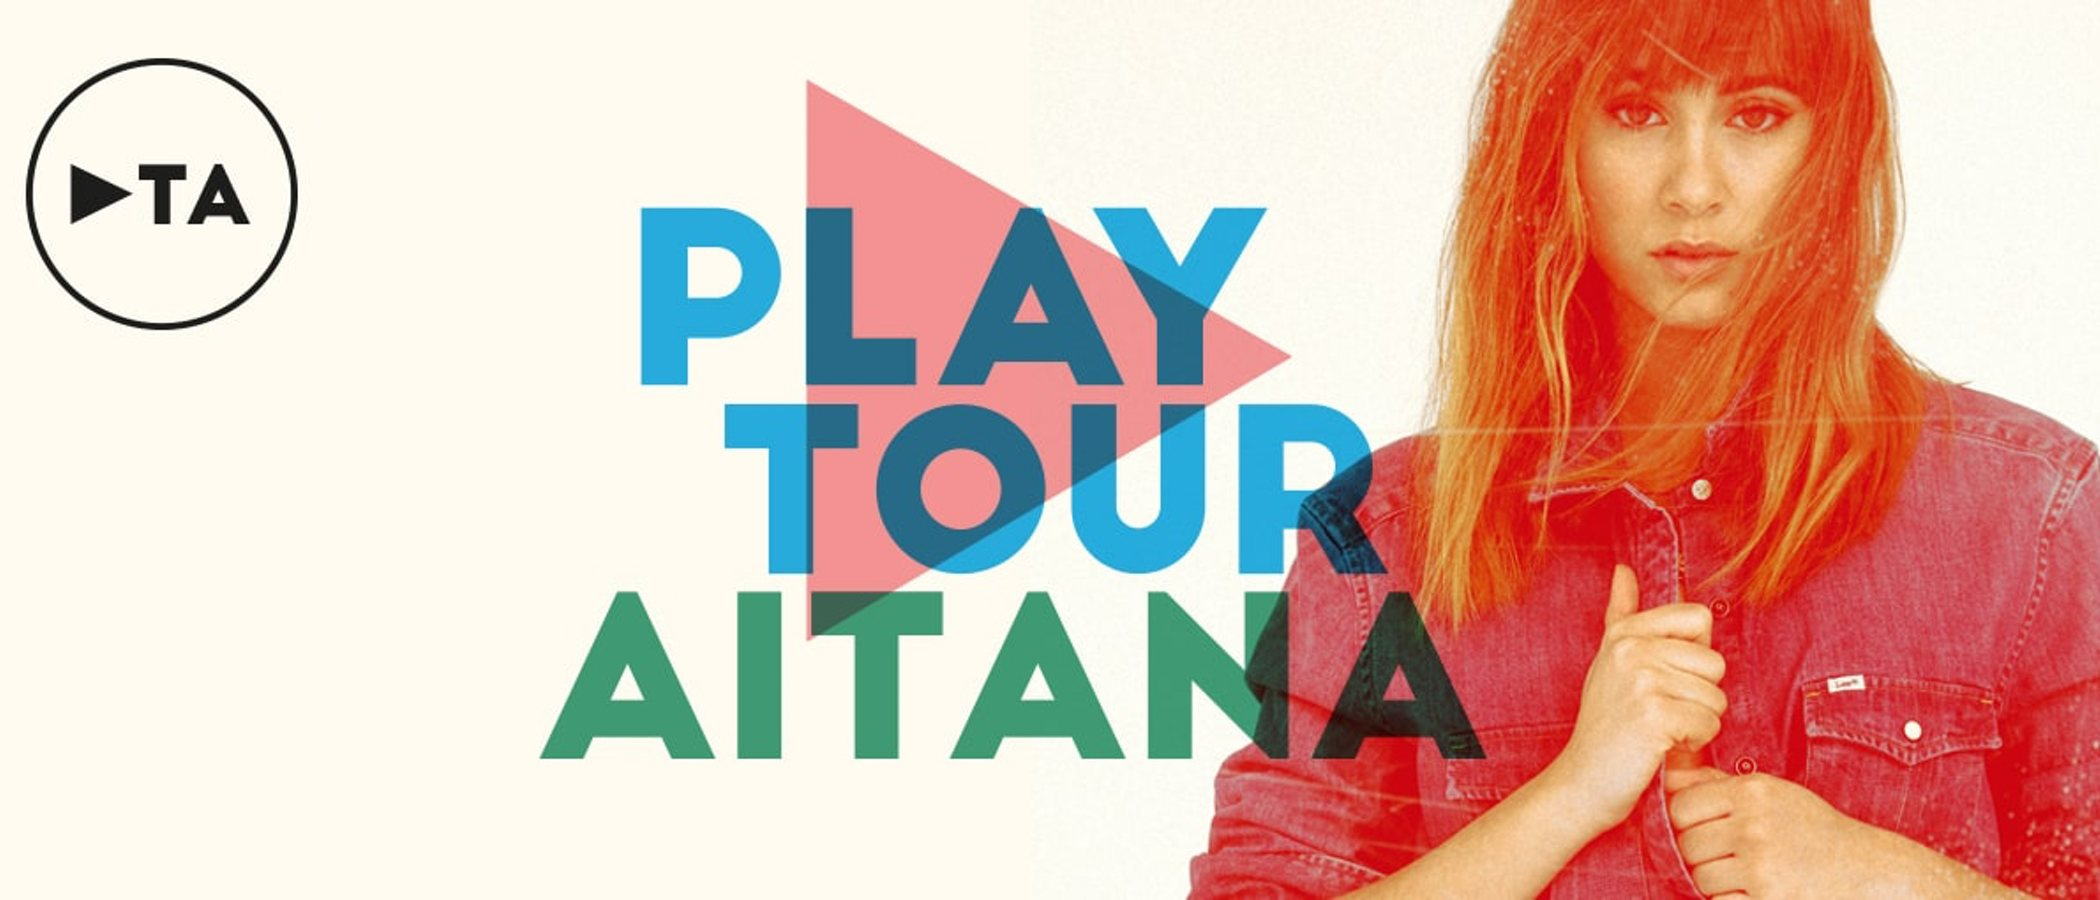 Ana Locking, la diseñadora que vestirá a Aitana en su gira #PlayTour